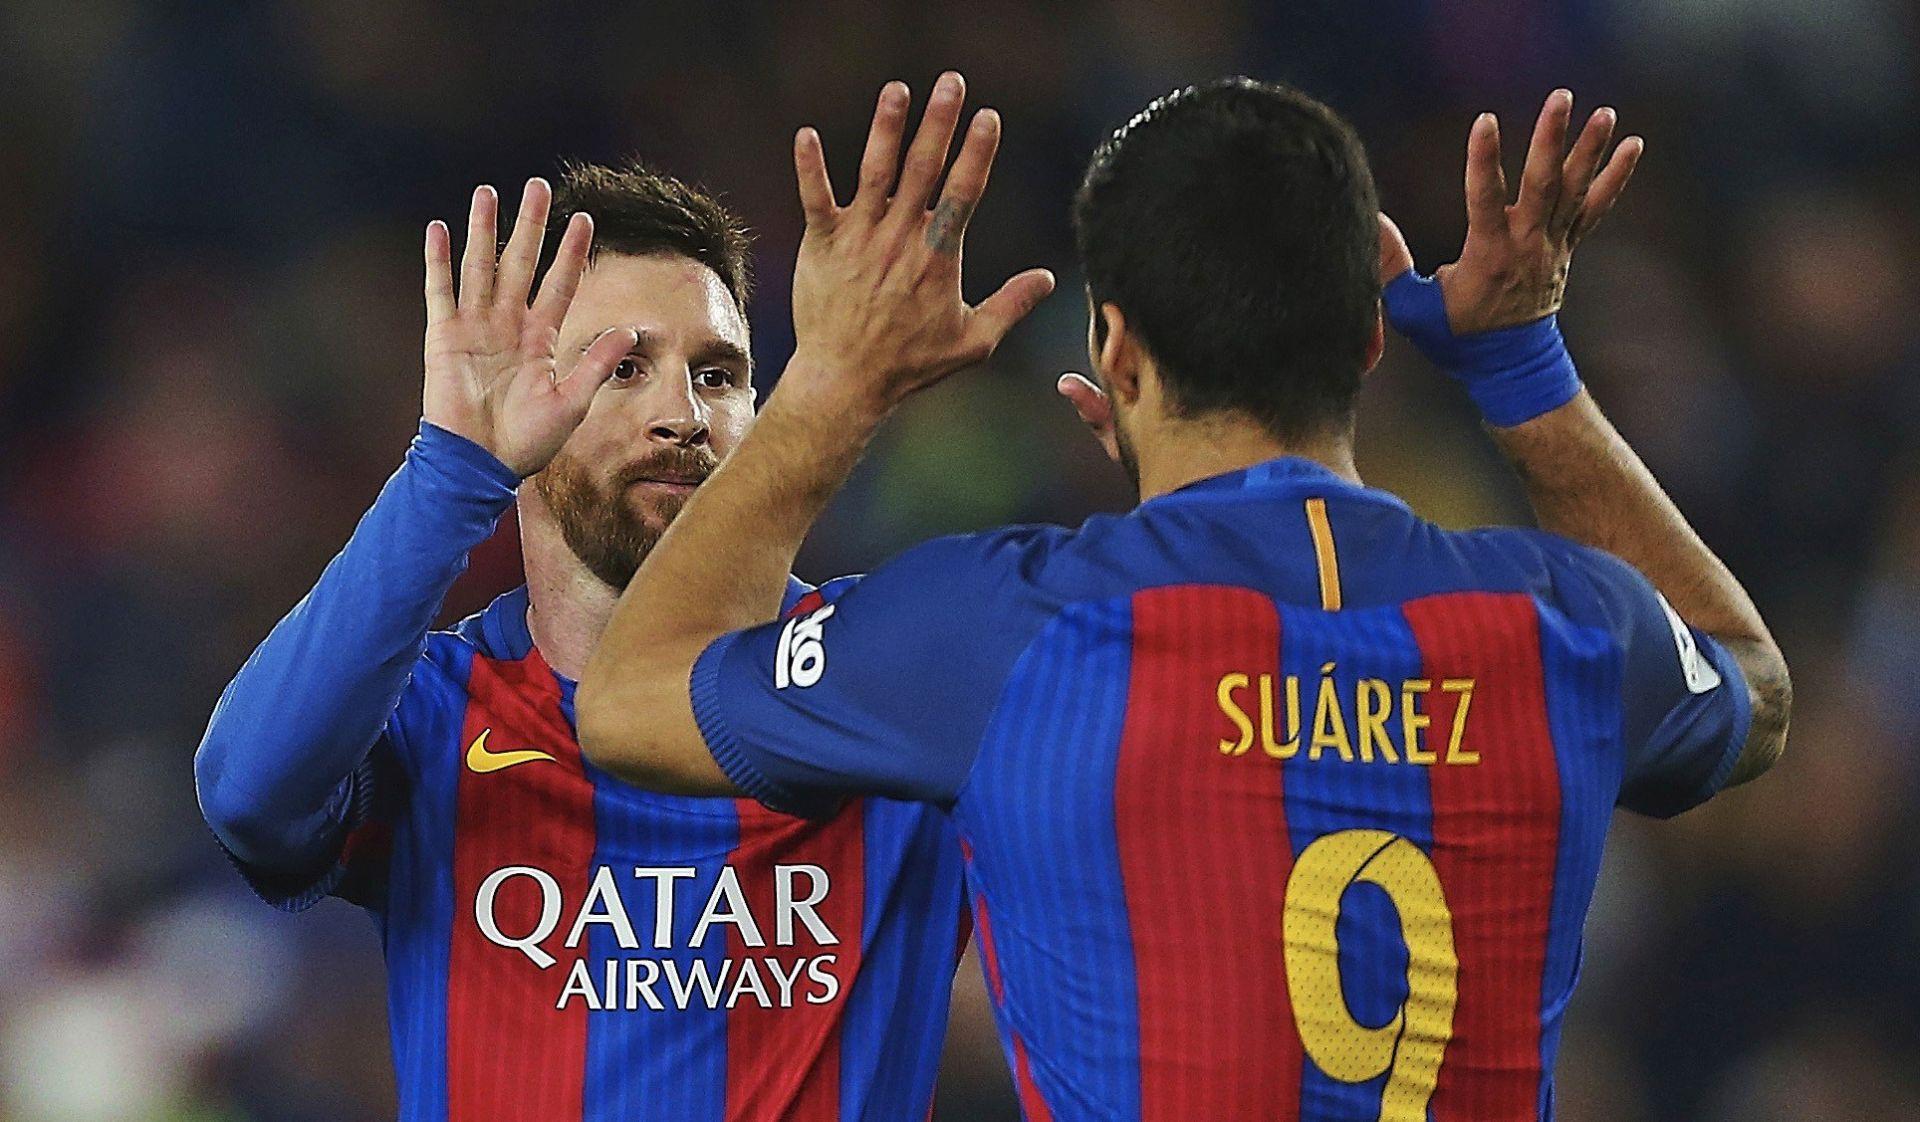 LIGA PRVAKA Real i PSG igrali šest puta, a Chelsea i Barcelona čak 15